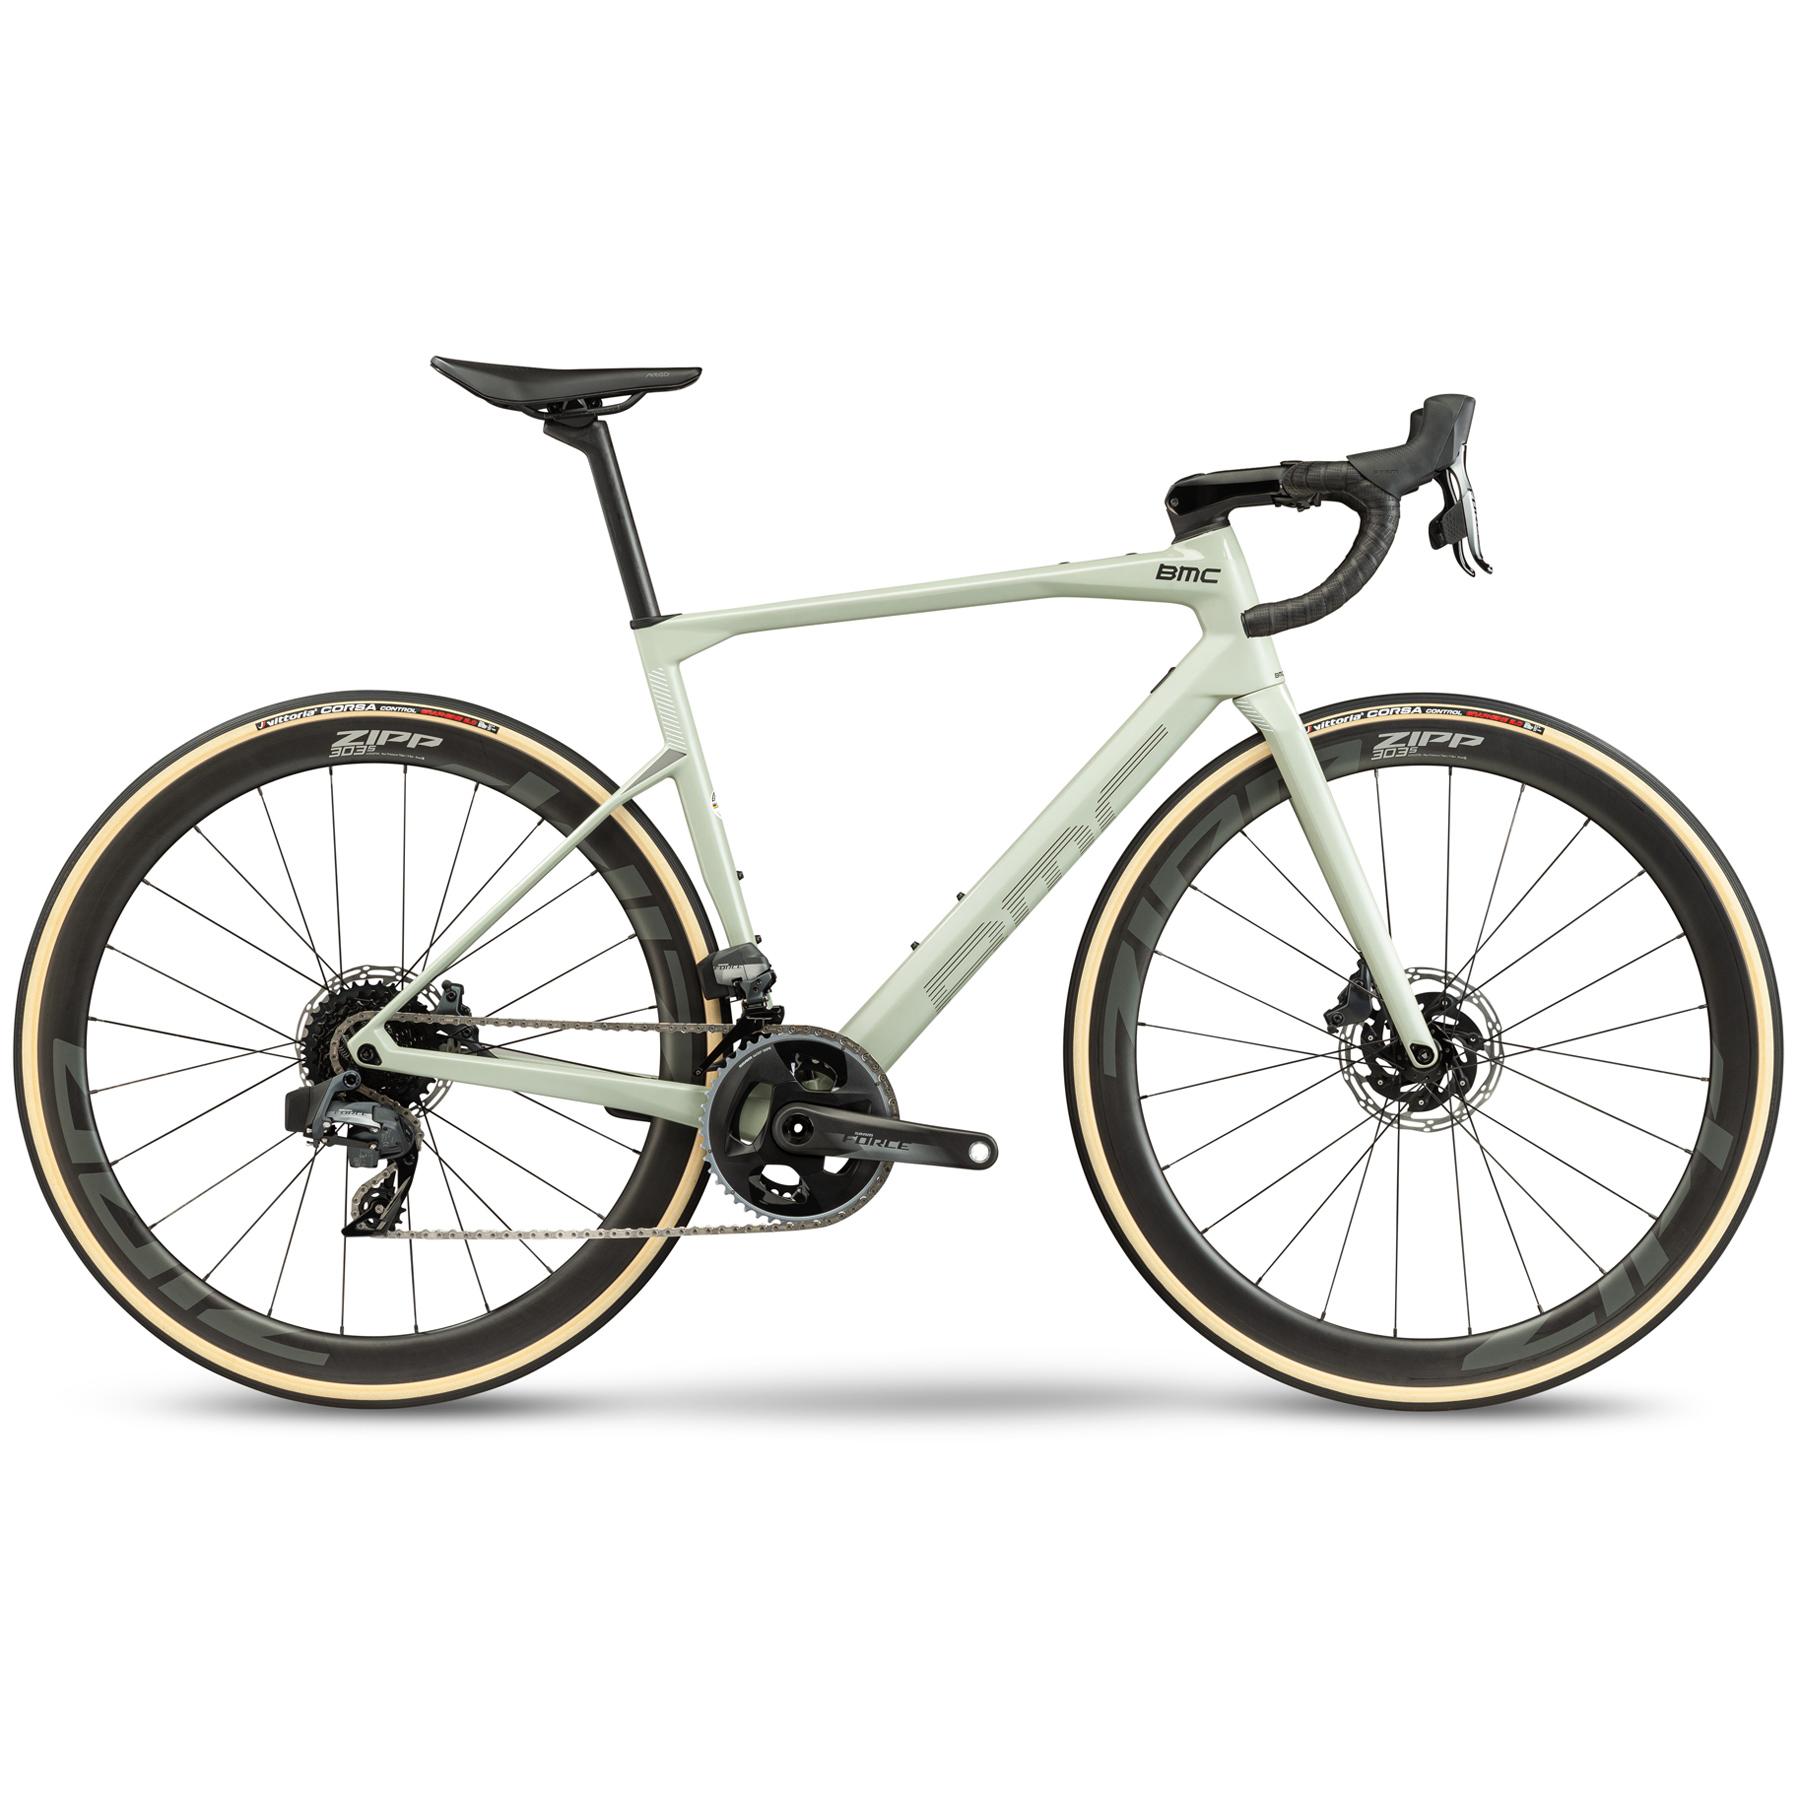 BMC ROADMACHINE 01 THREE - Force eTap AXS HRD Roadbike - 2021 - green sand & black